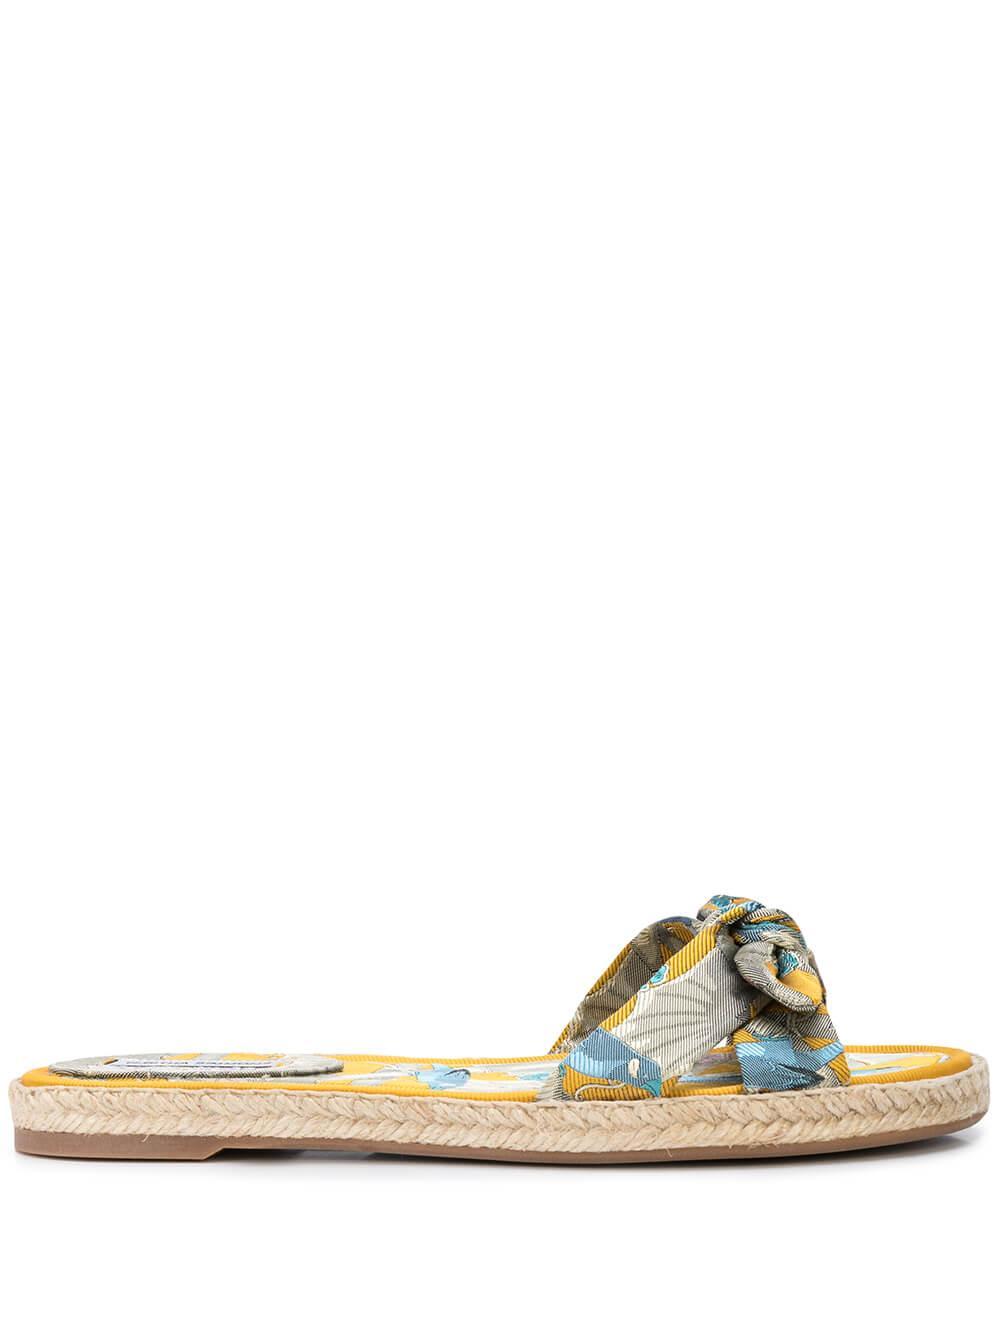 Heli Jacquard Flat Slide Sandal